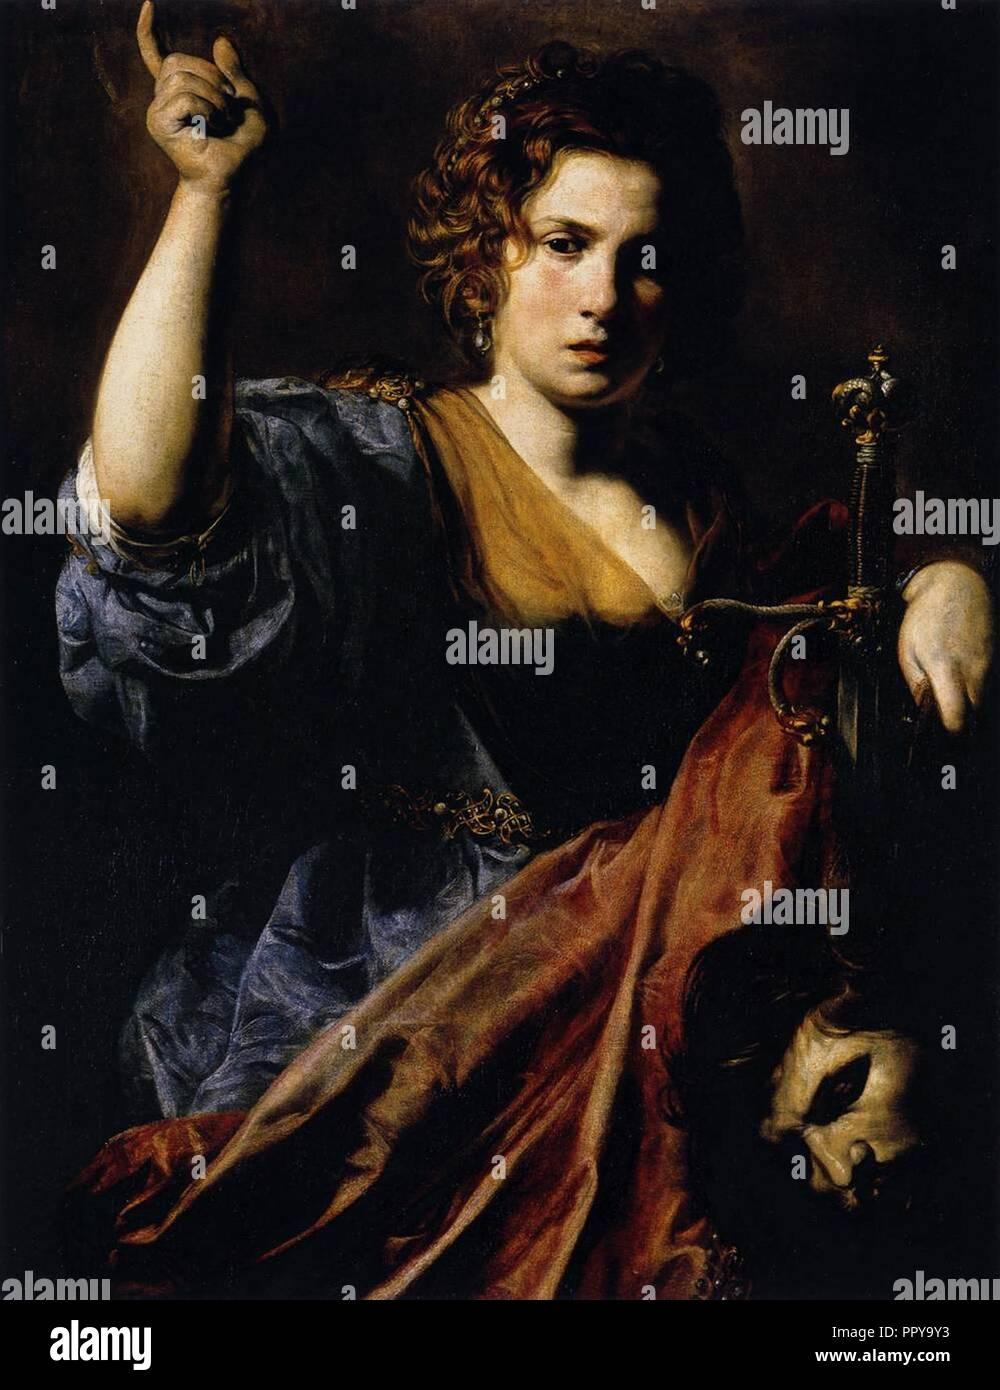 Valentin de Boulogne, Judith. - Stock Image